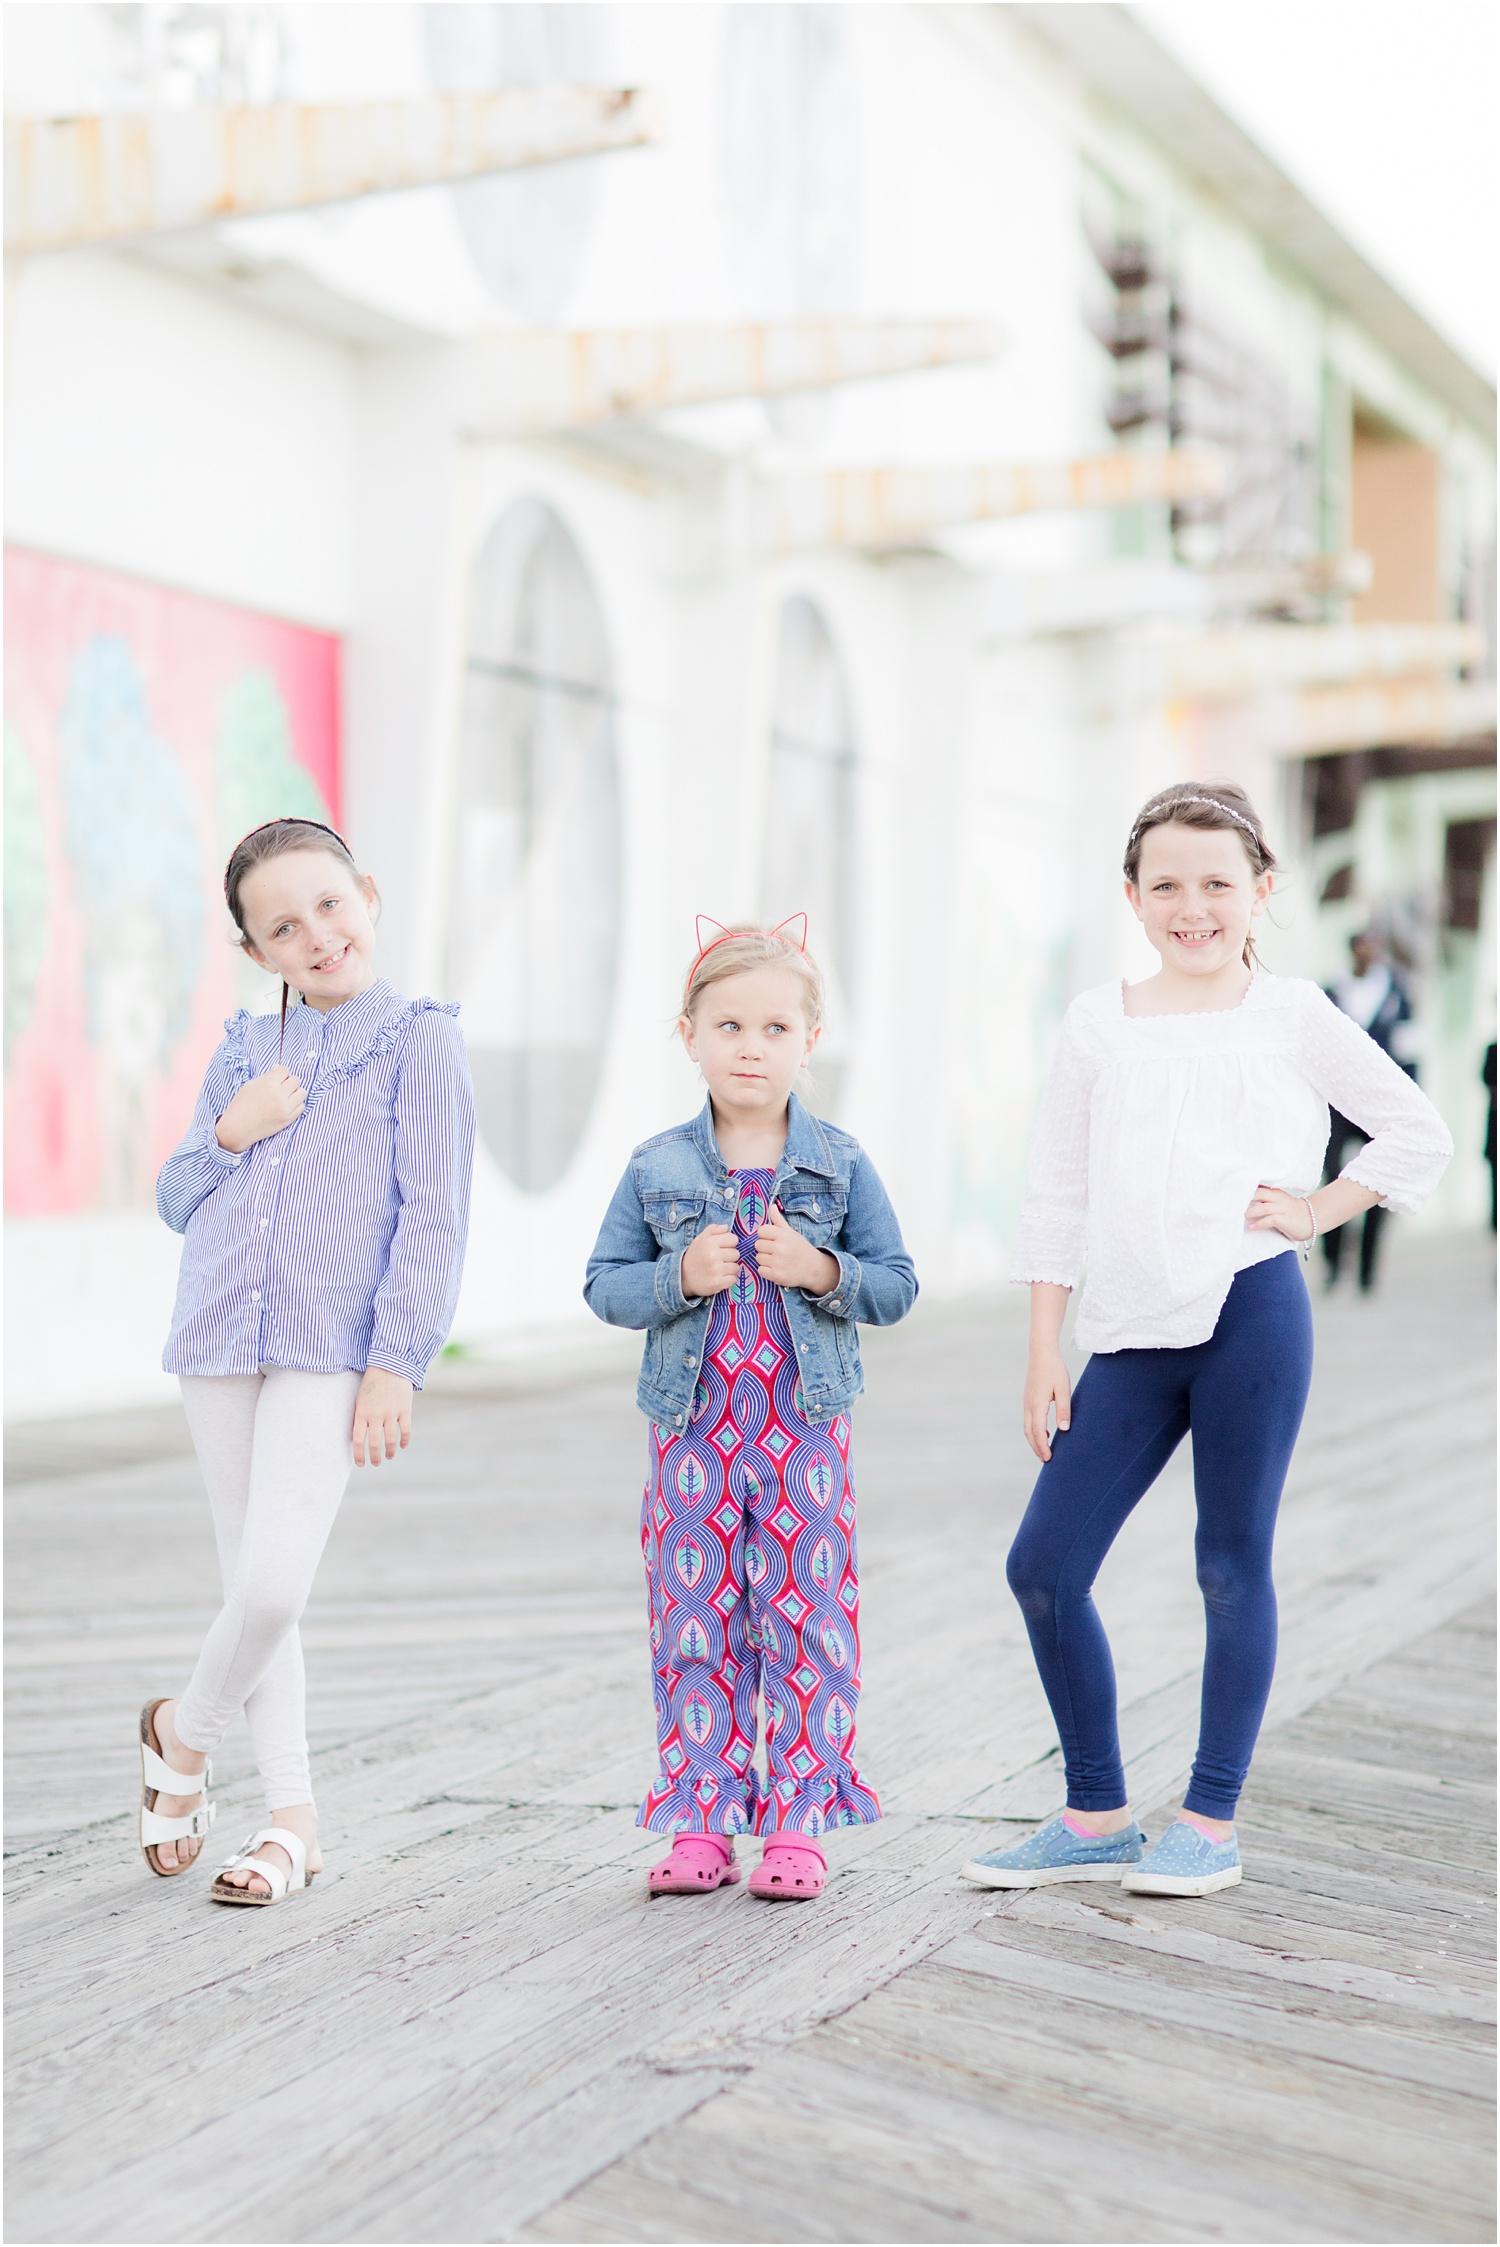 3 girls posing in front of Asbury Park boardwalk murals